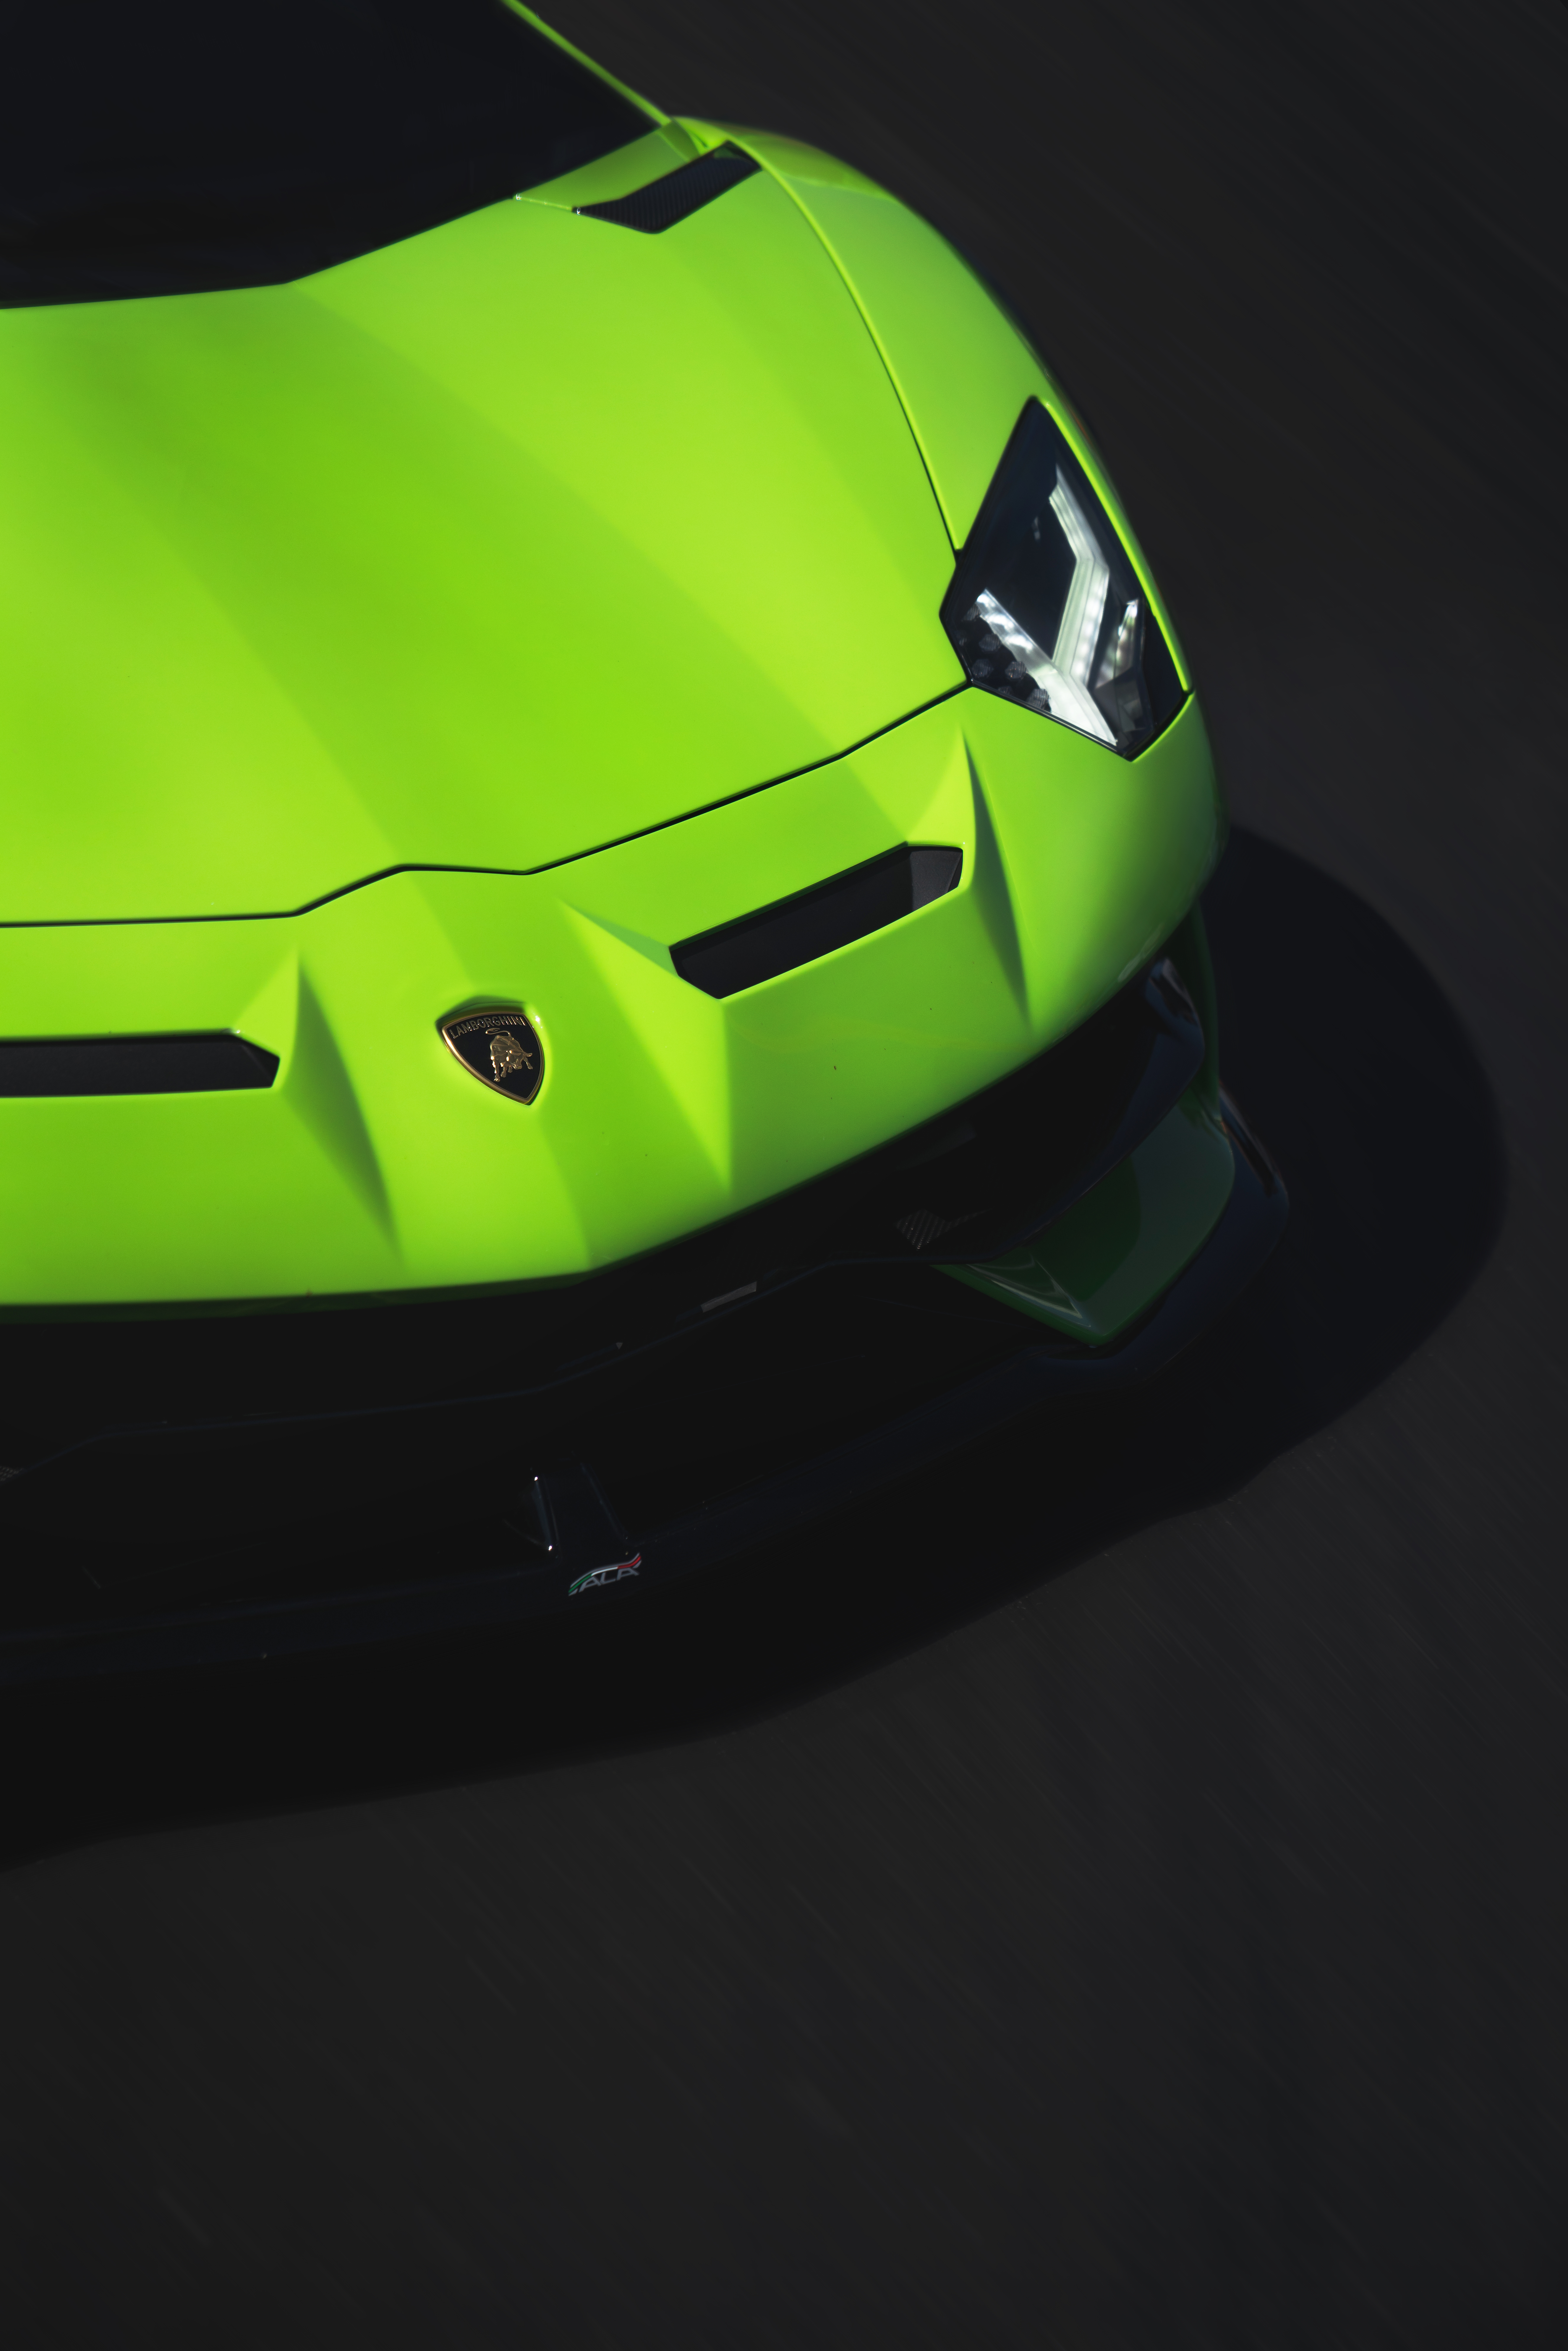 green lamborghini luxury car